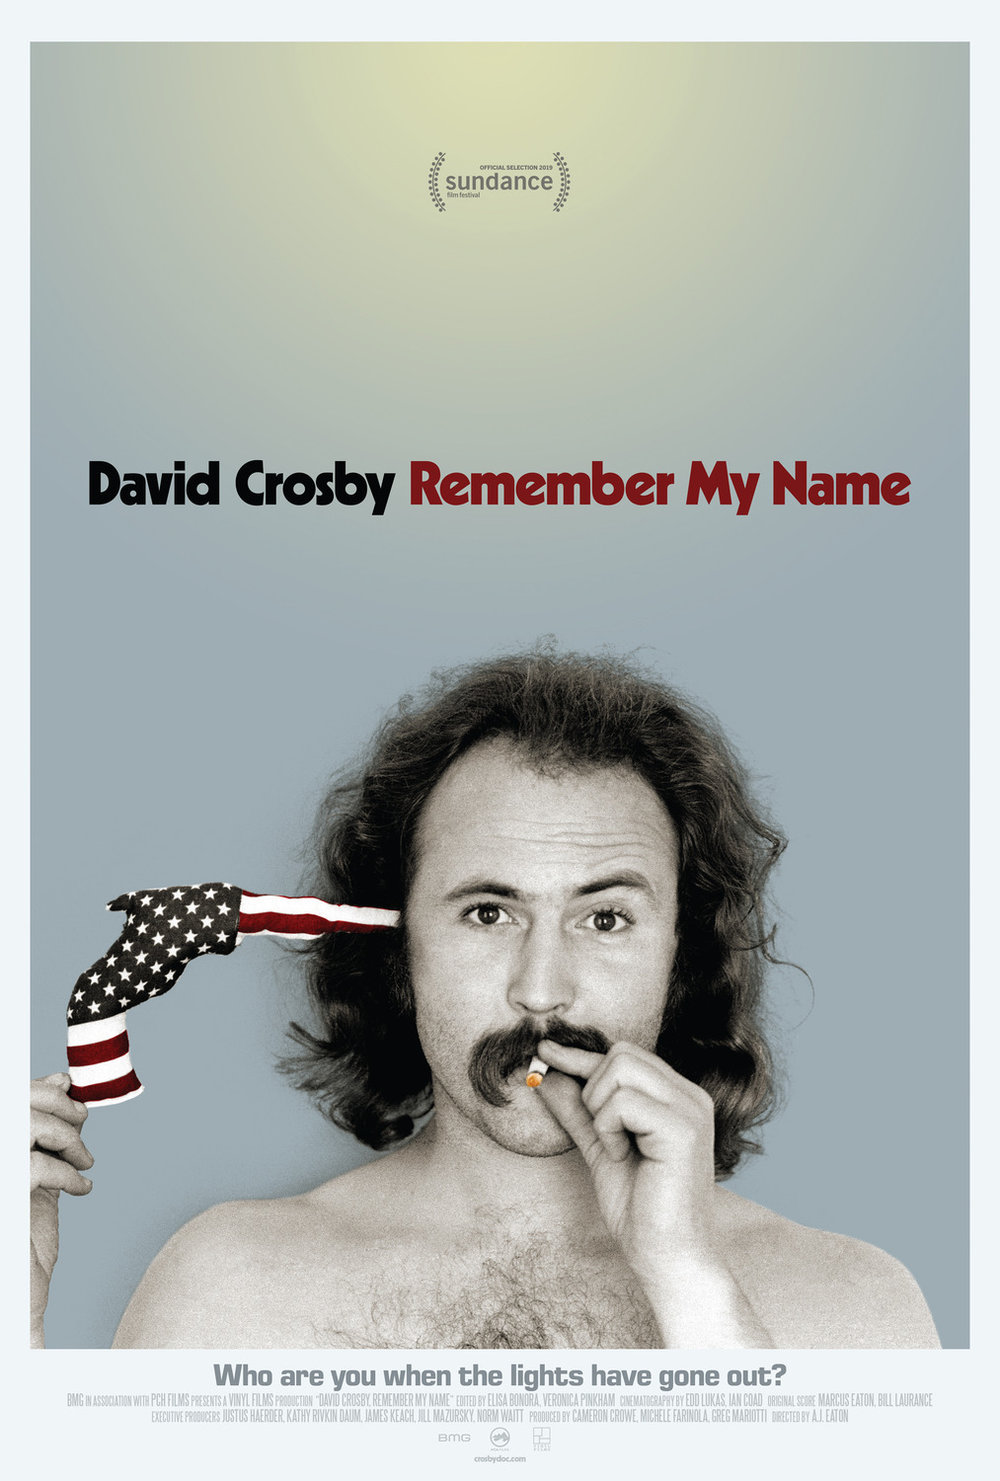 david_crosby_remember_my_name.jpg